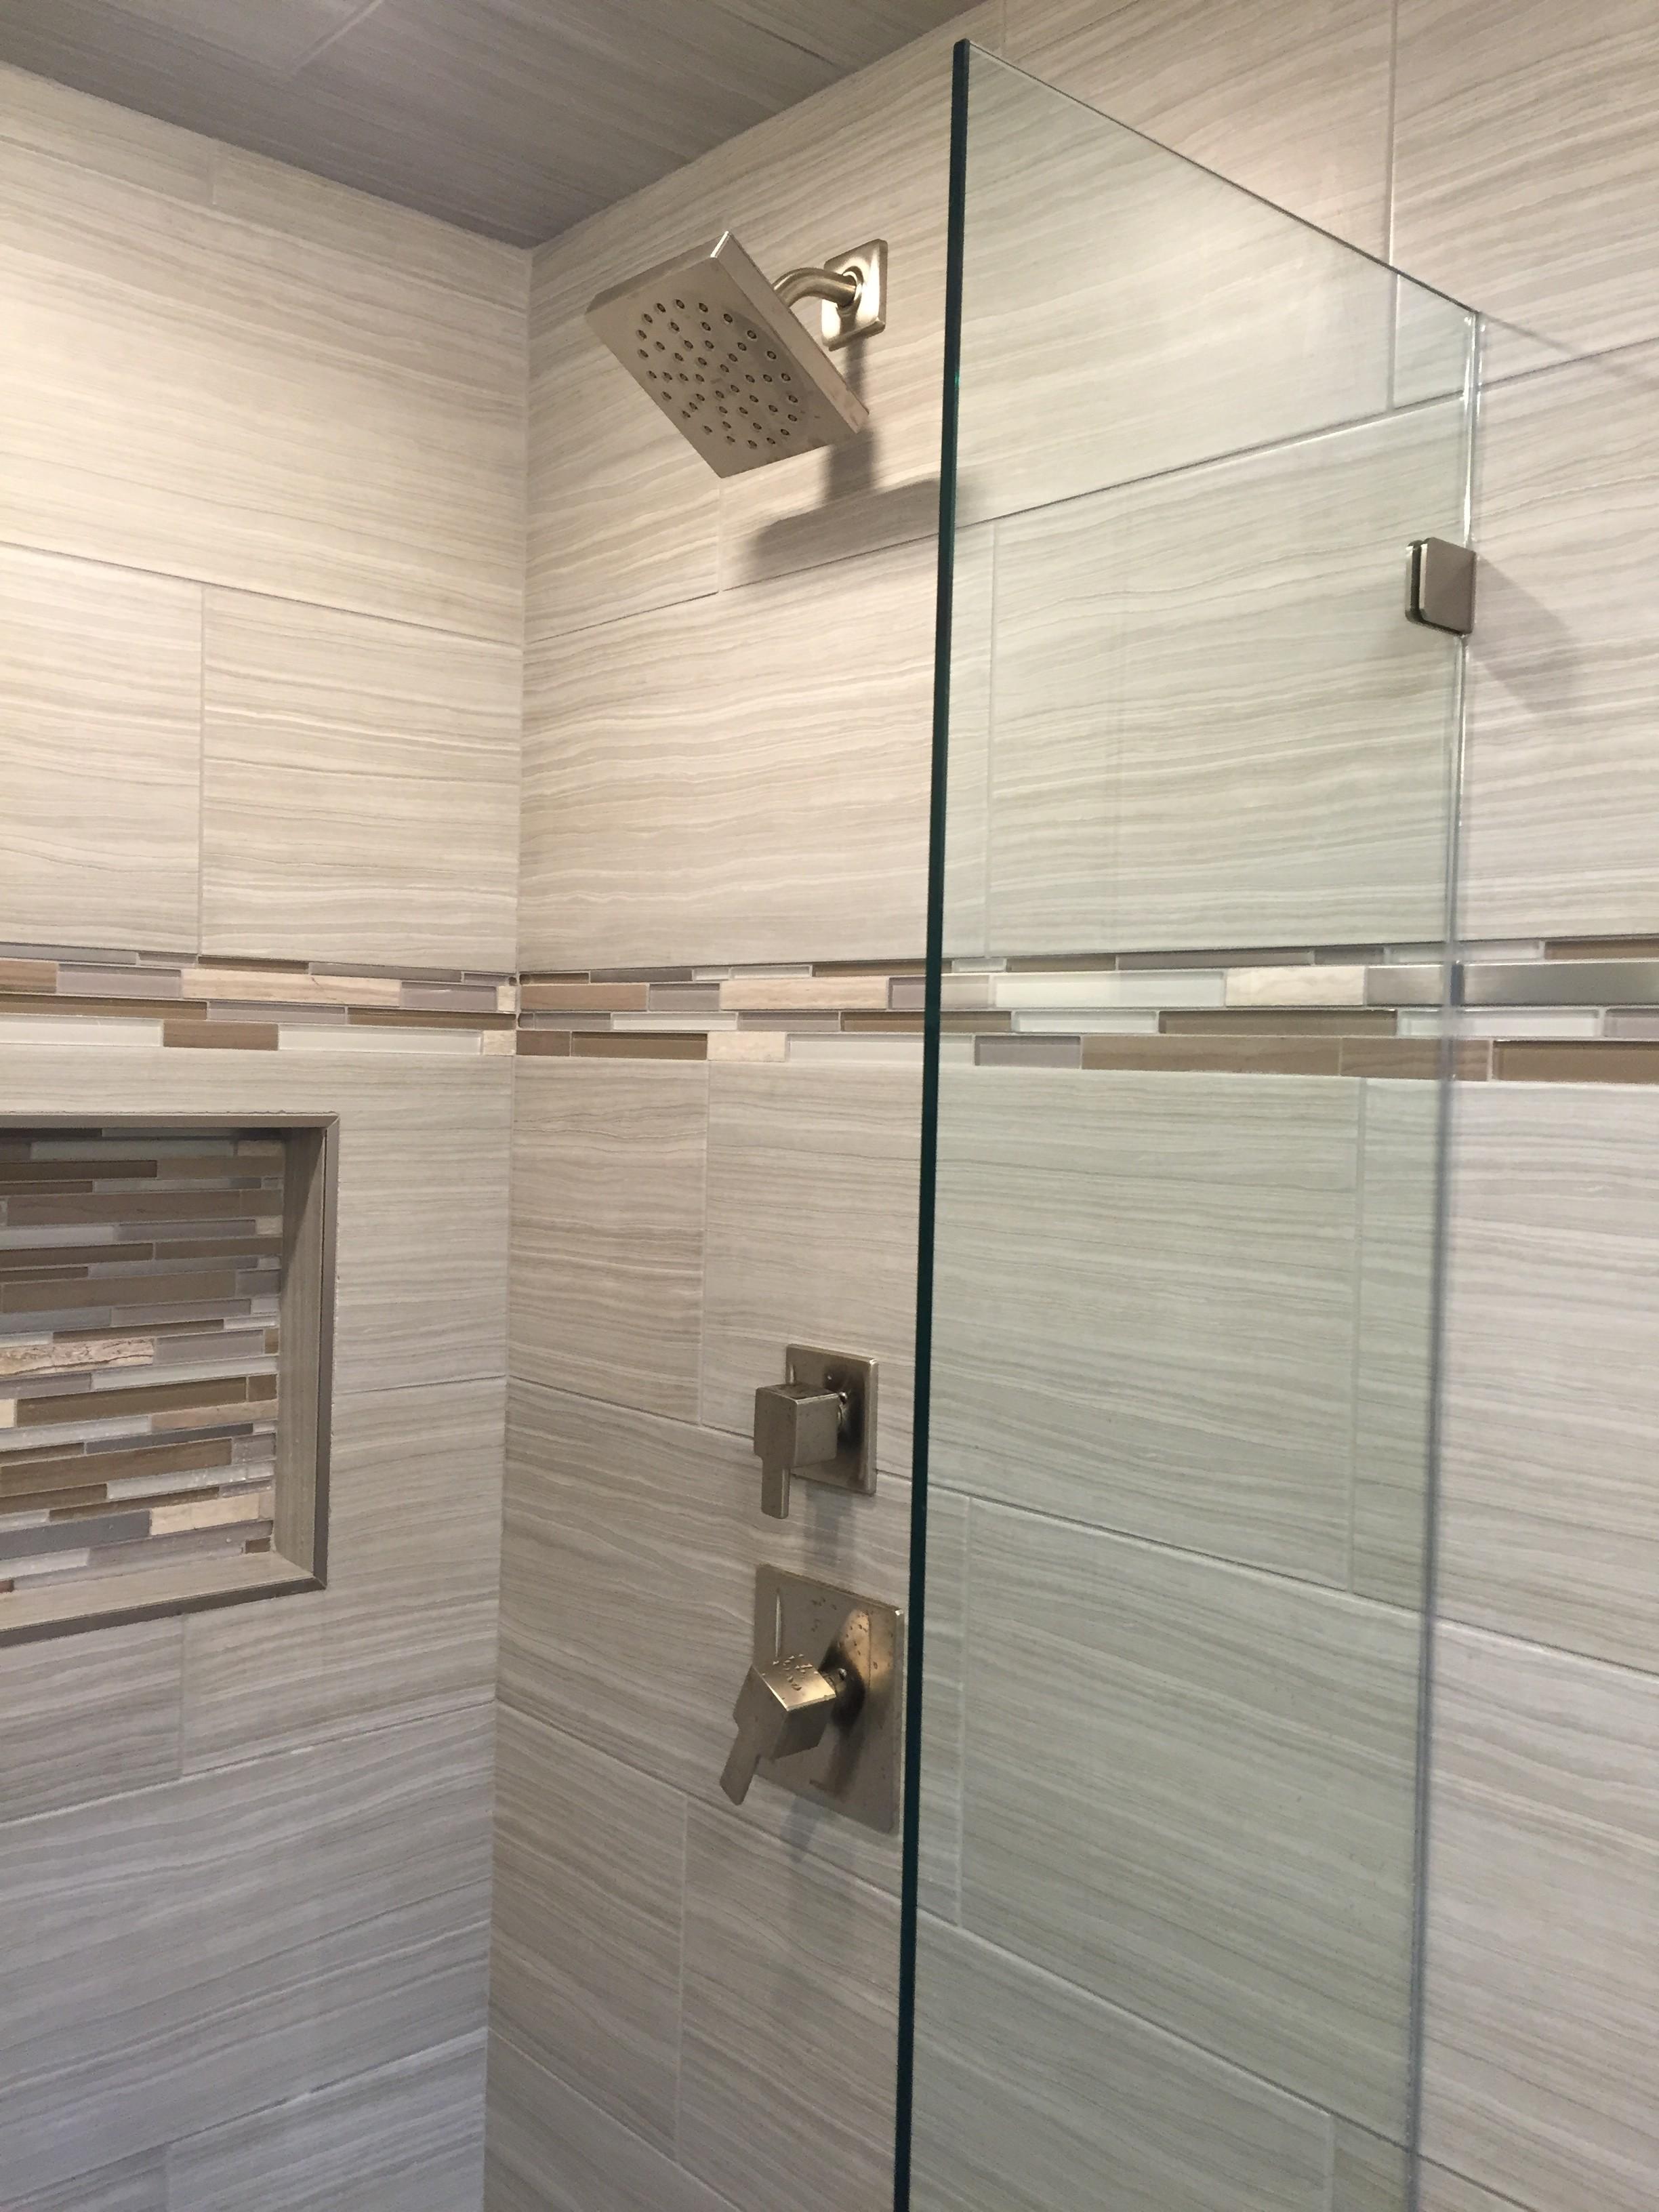 Master Bathroom Remodel in Waterford CT